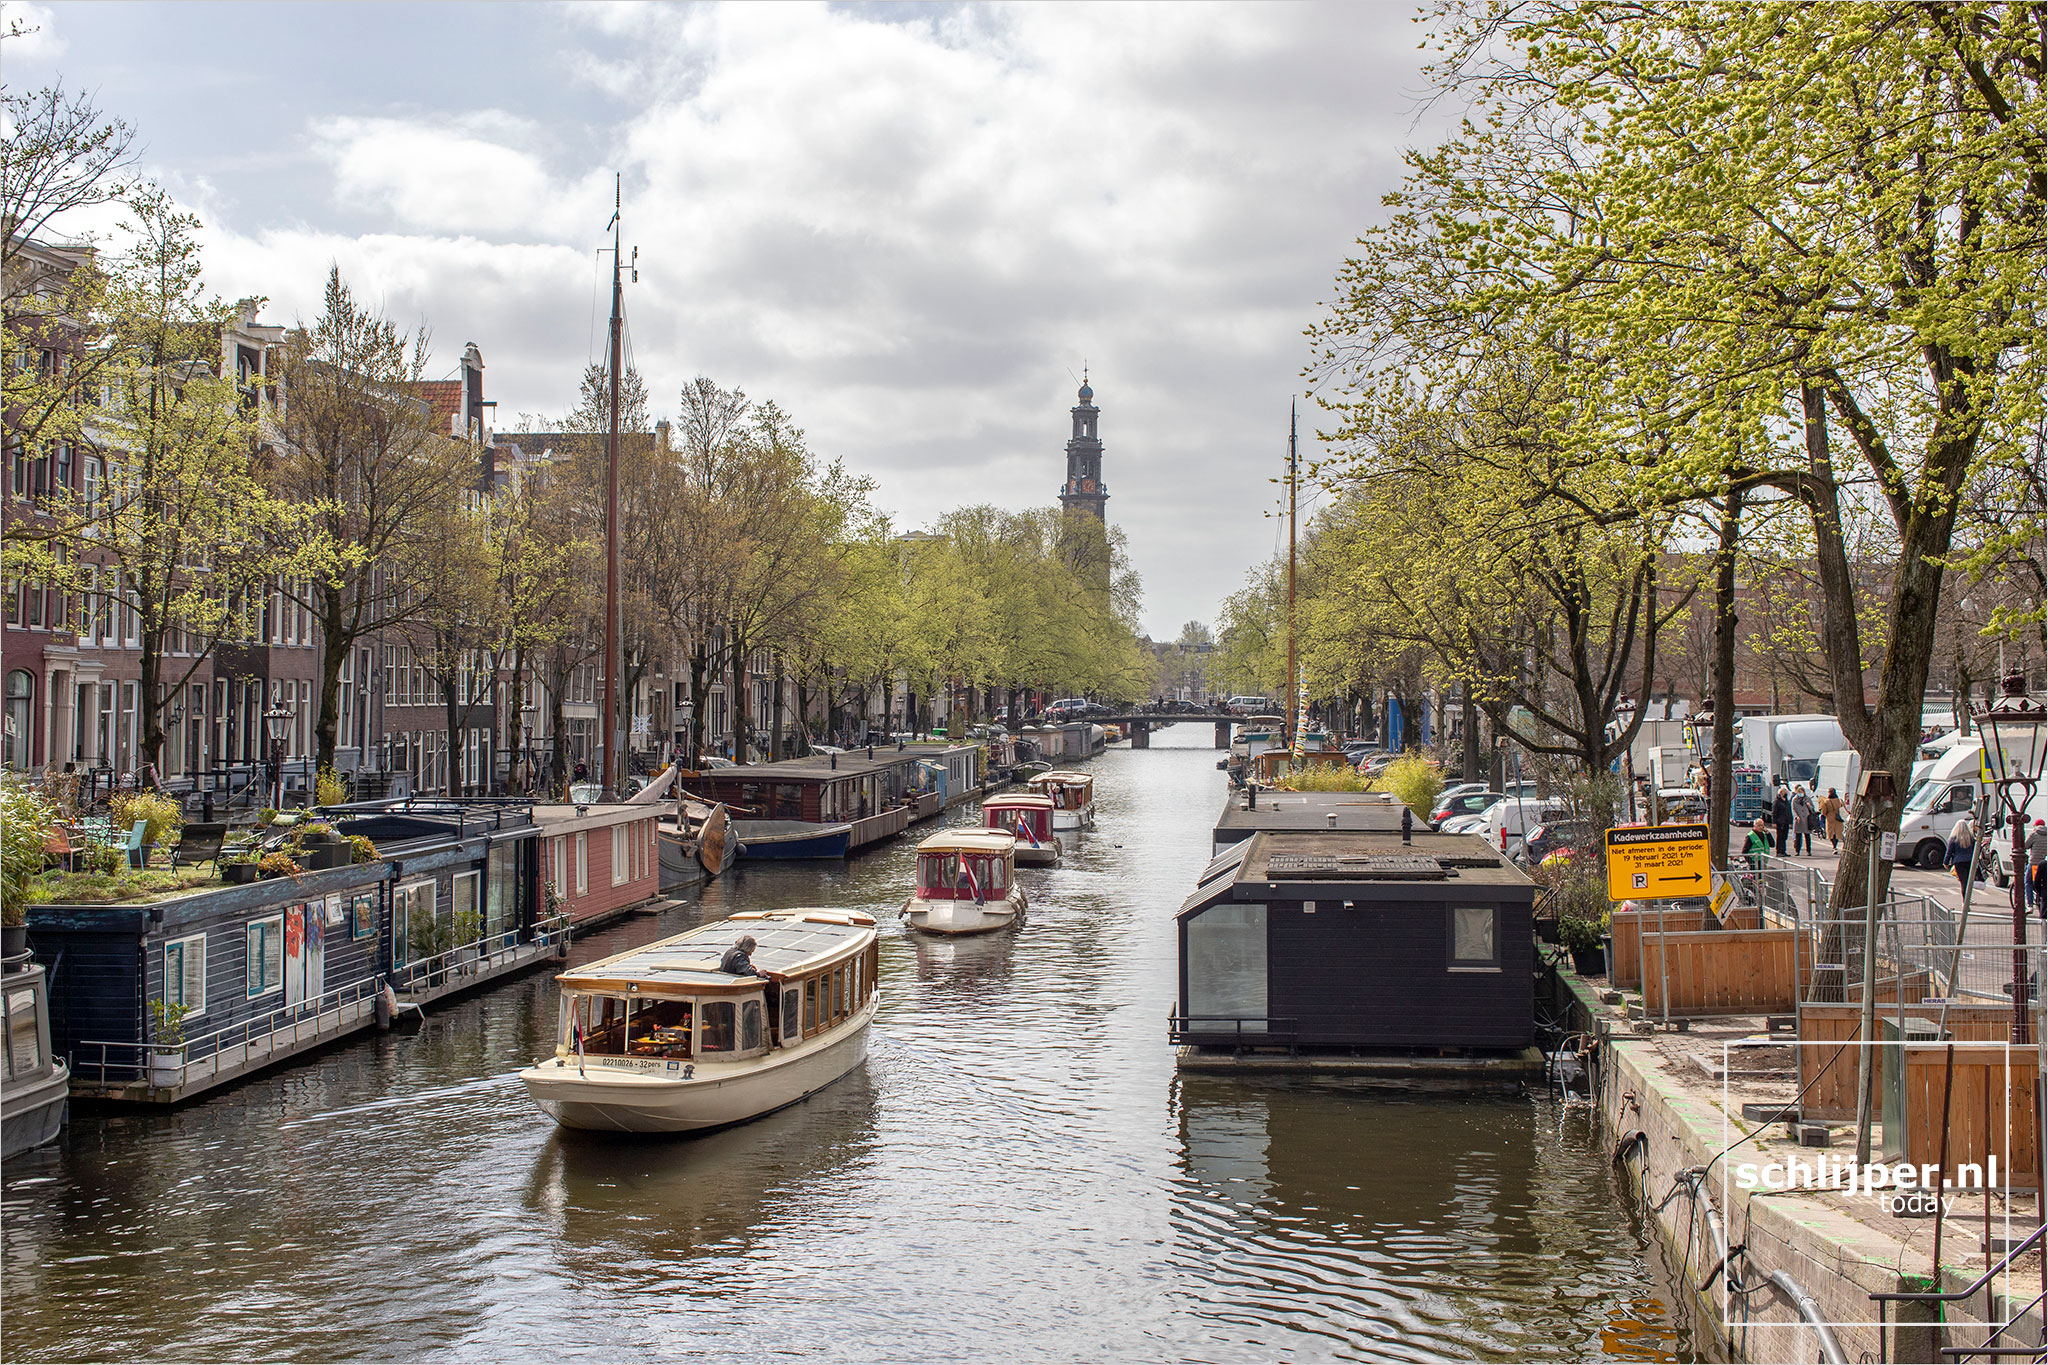 The Netherlands, Amsterdam, 3 april 2021